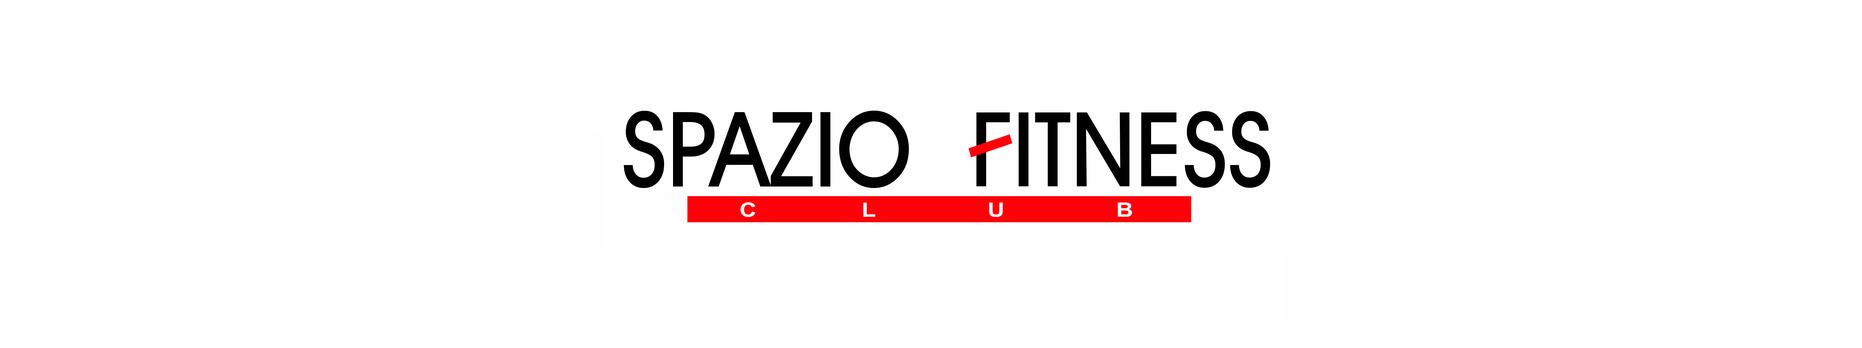 Associazione Spazio Fitness Club SSD arl - logo